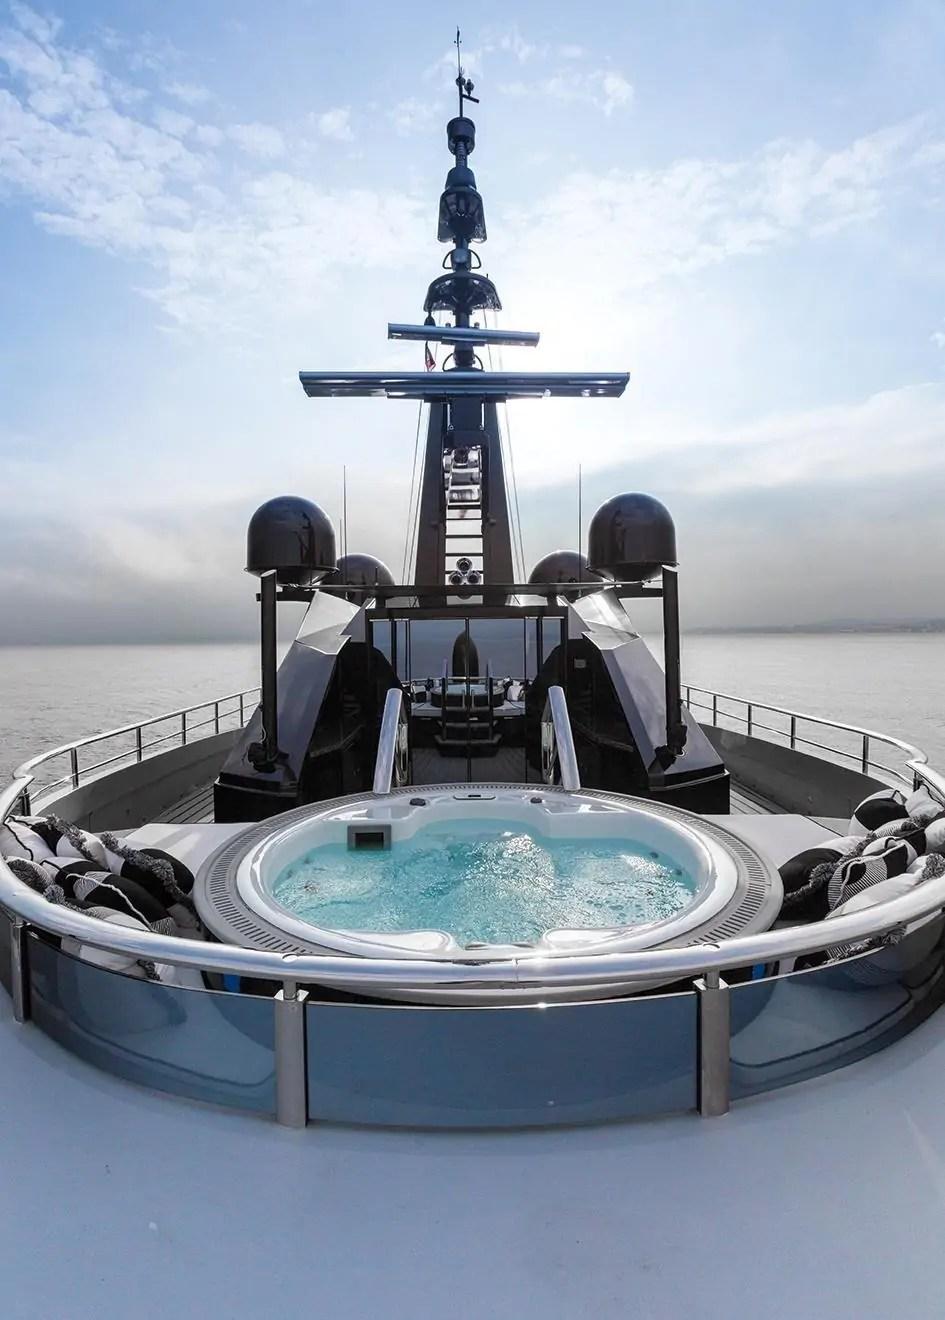 14983829641623385335126899099_isa66m-okto-grandturismo-motor-yacht-39